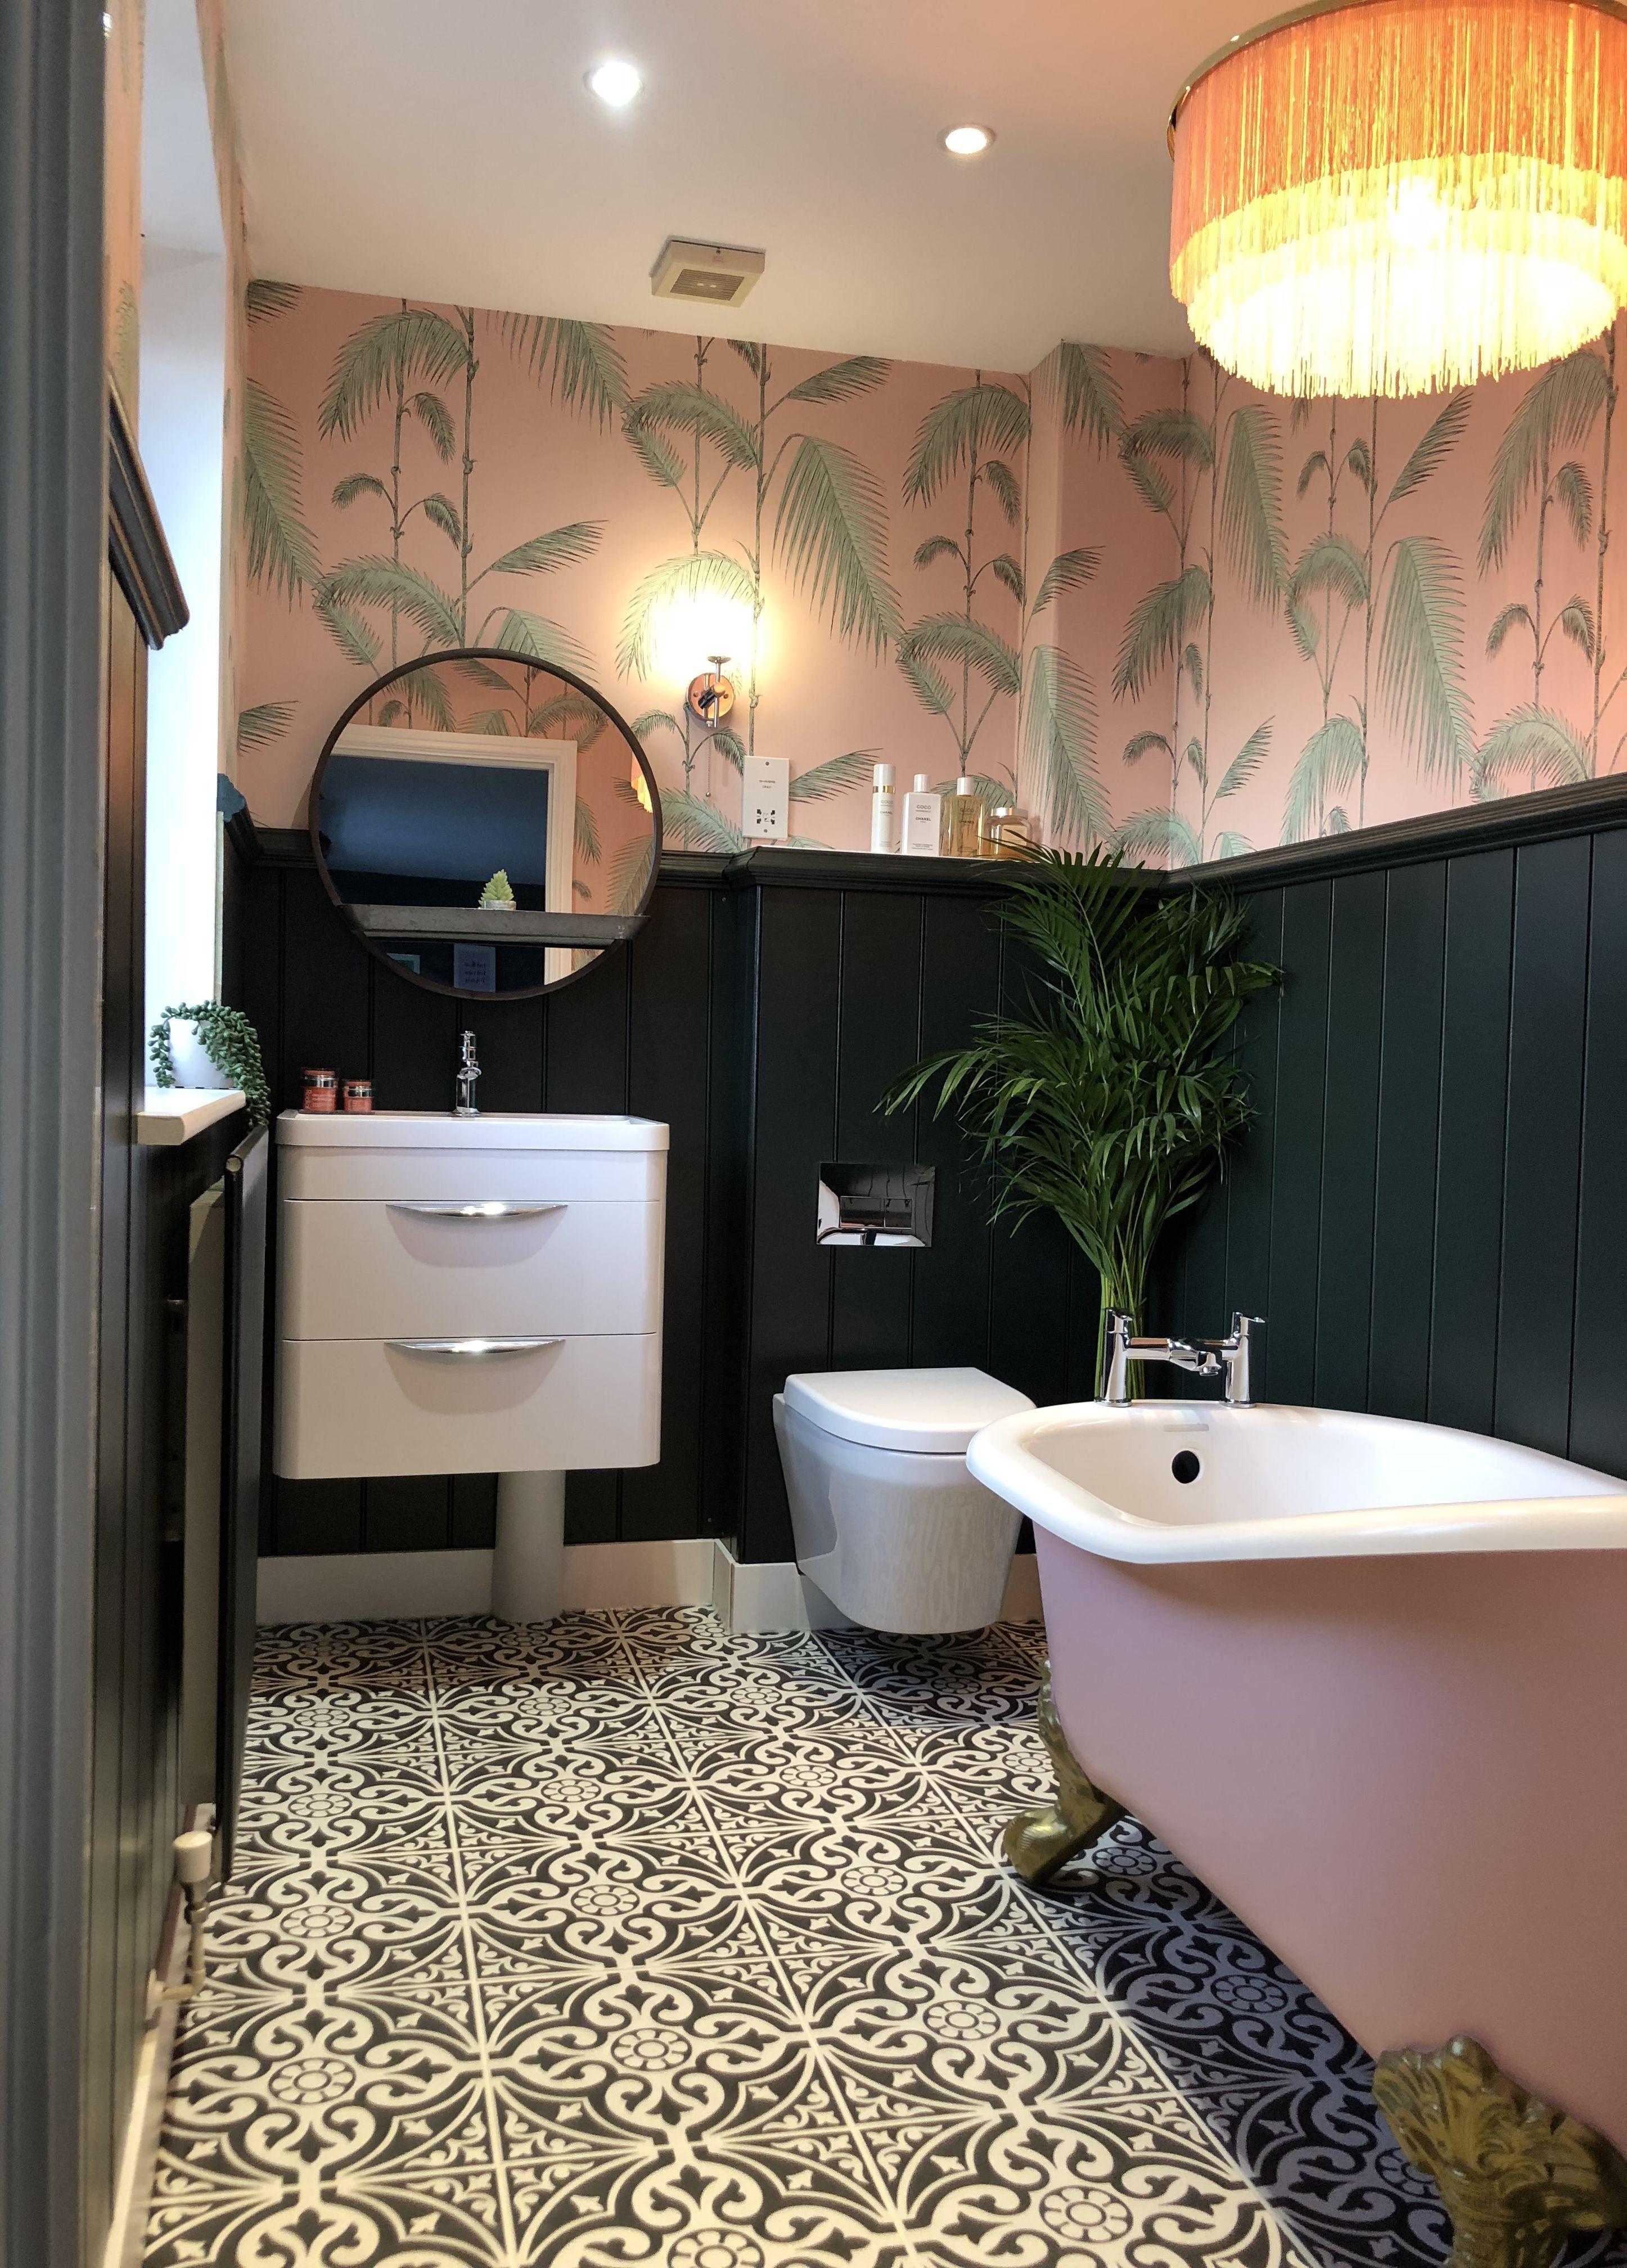 Jools Pink And Green Bathroom Of Dreams Green Bathroom Bathroom Red Green Bathroom Decor